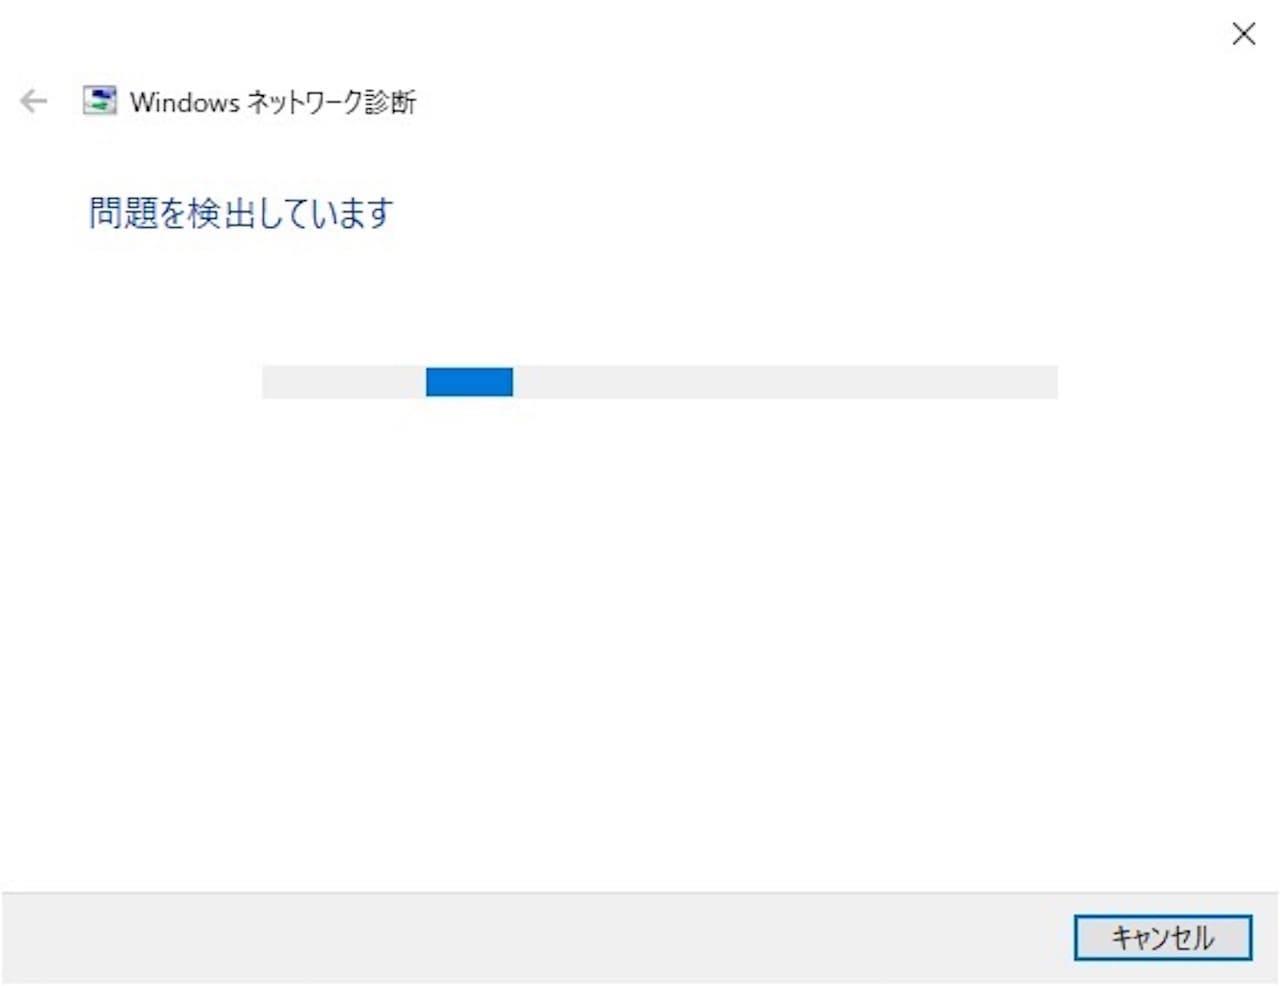 Windows10でトラブルシューティングを実行する方法③